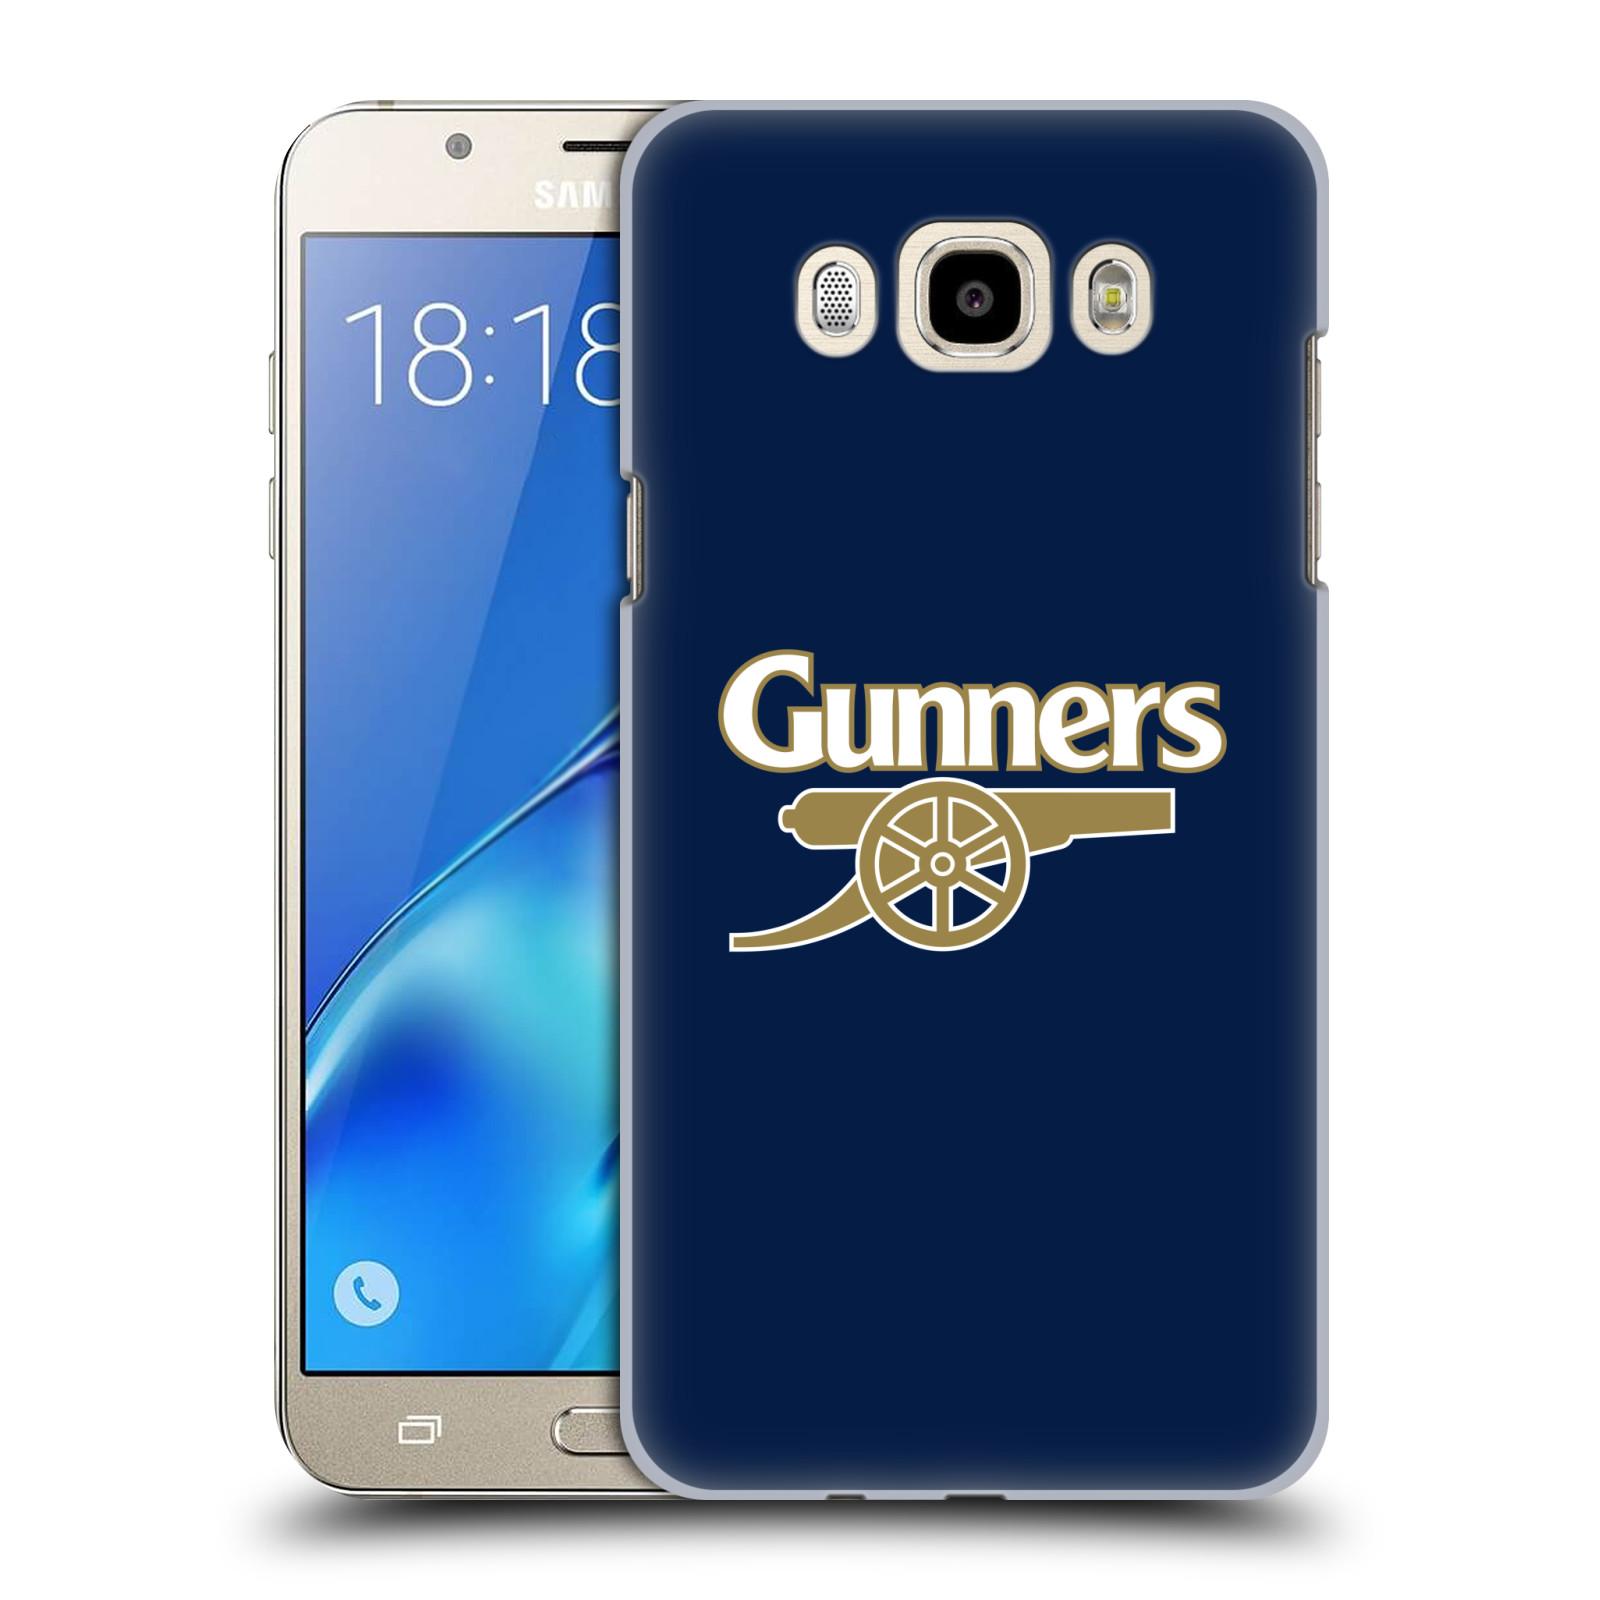 Plastové pouzdro na mobil Samsung Galaxy J7 (2016) - Head Case - Arsenal FC - Gunners